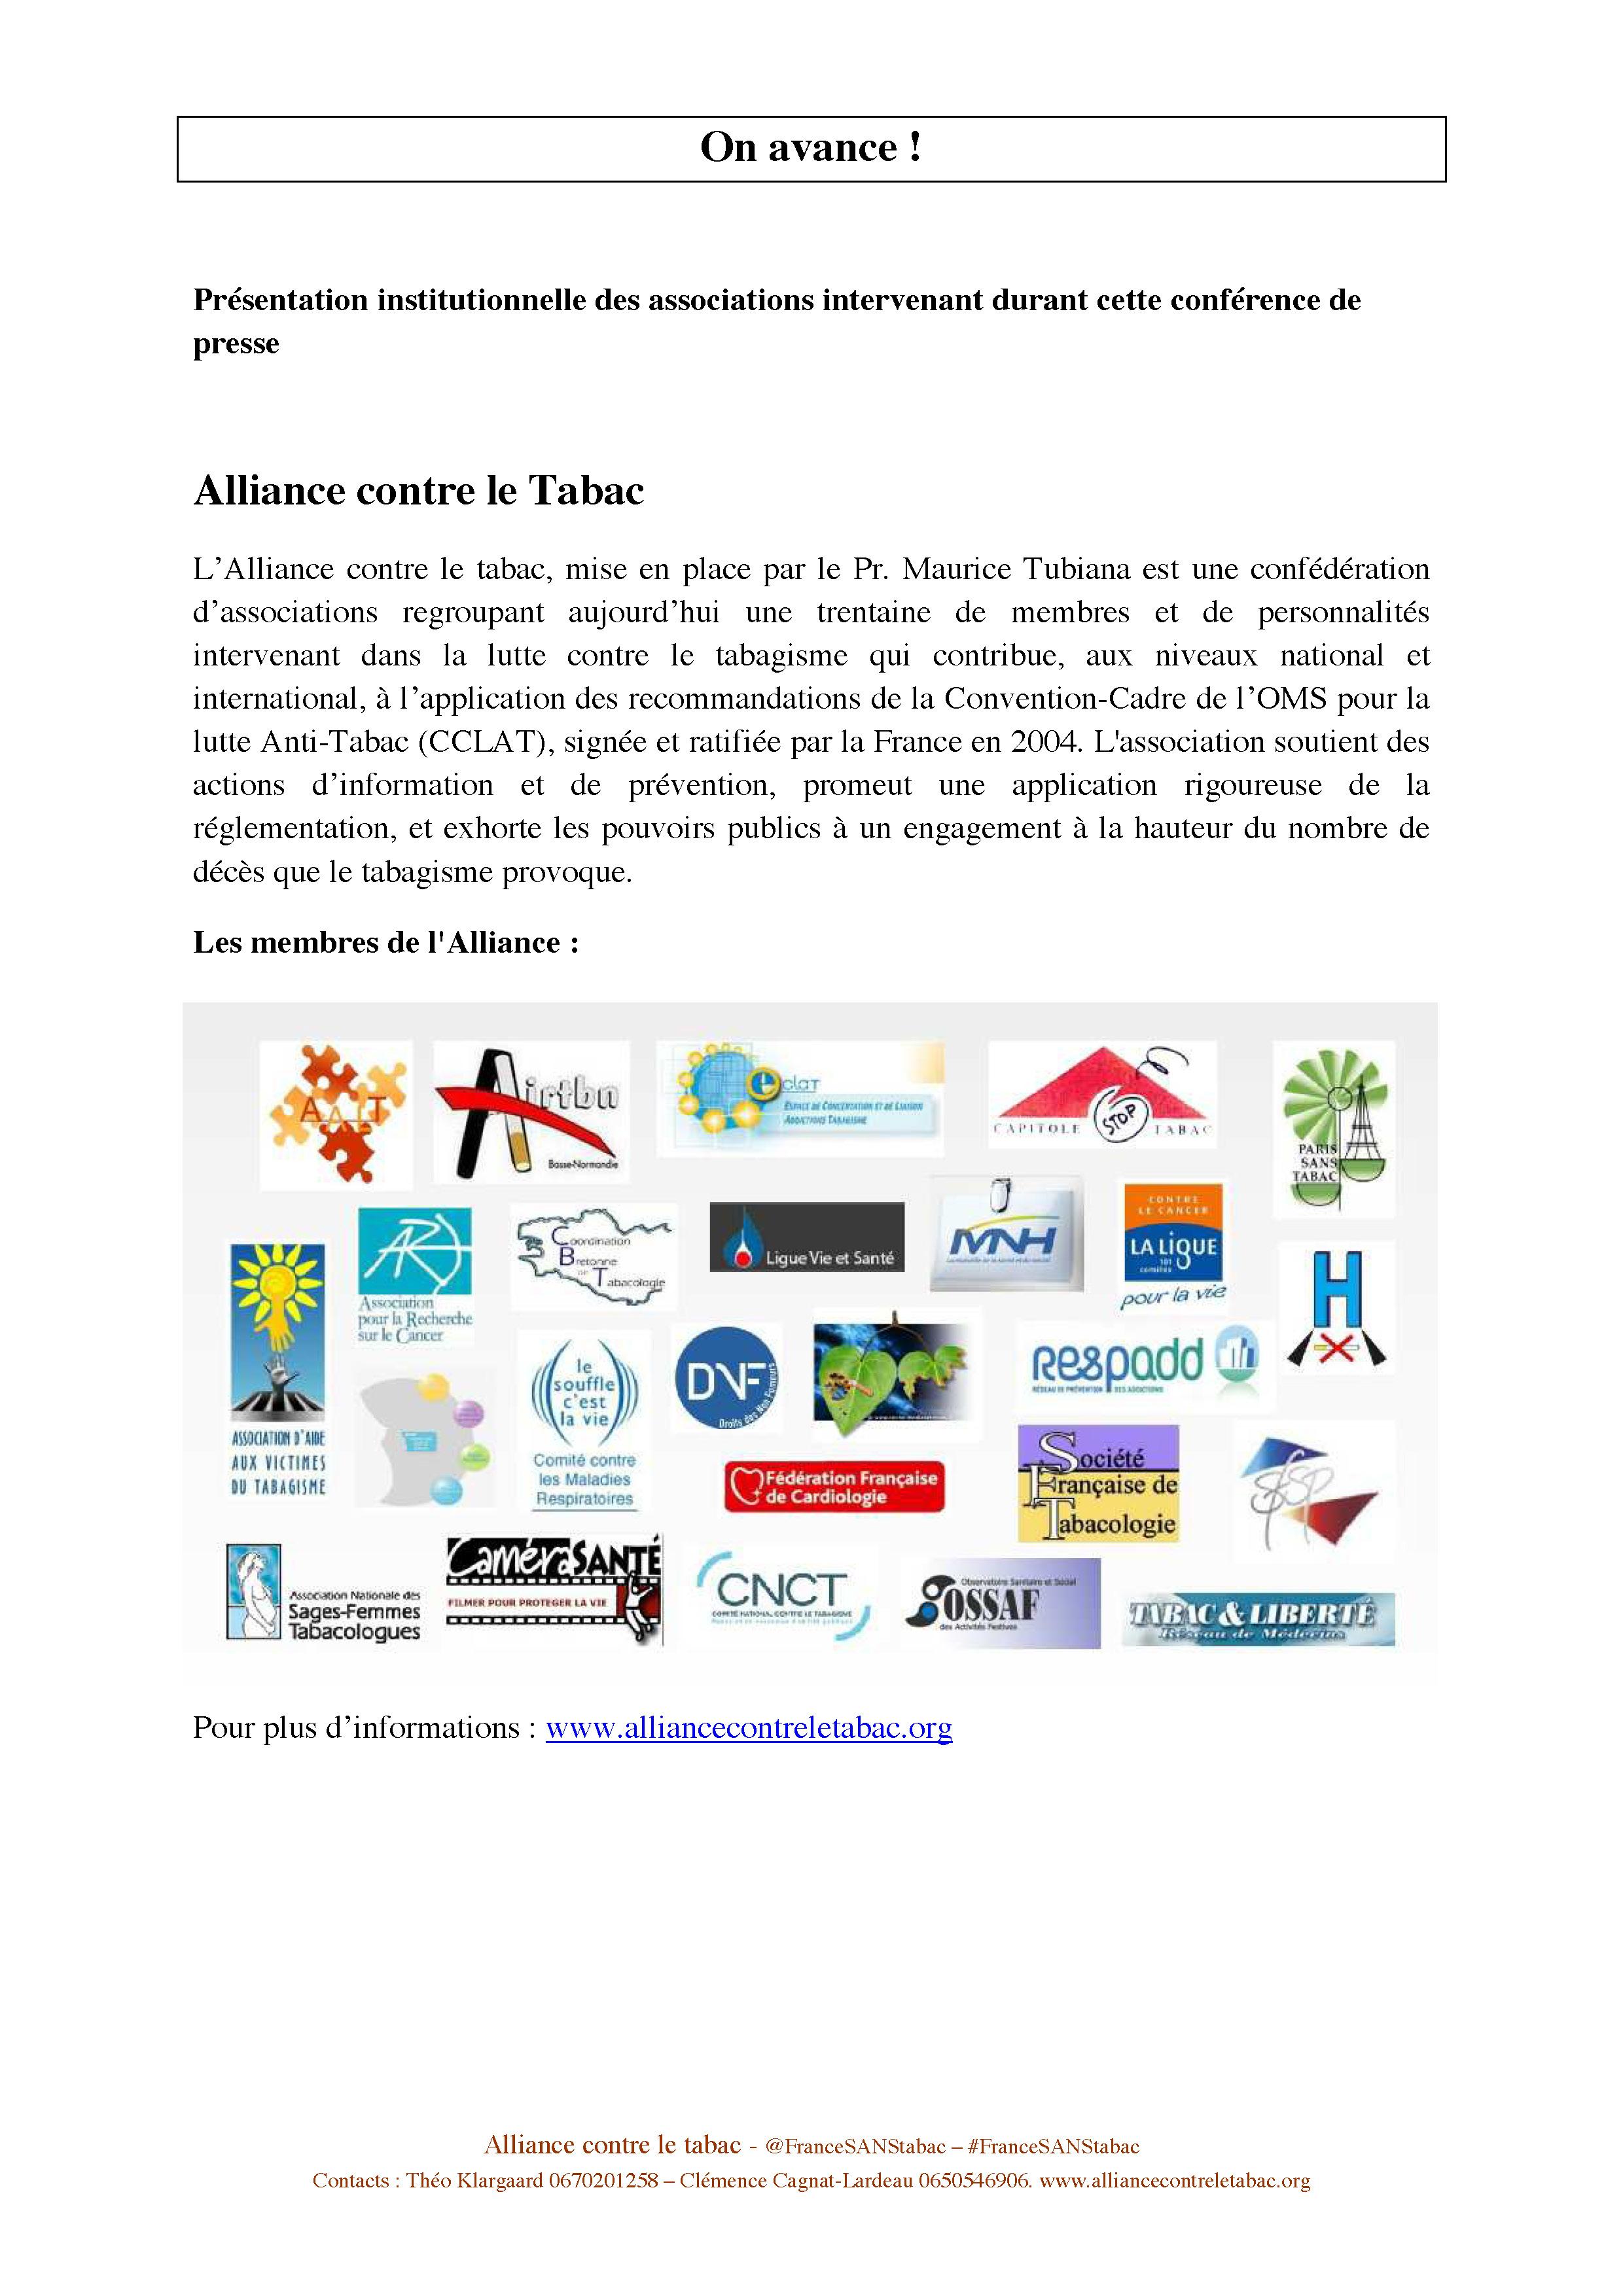 Alliance-DP_journee-mondiale-sans-tabac-avec-annexes-vf-30mai2016_Page_05.jpg